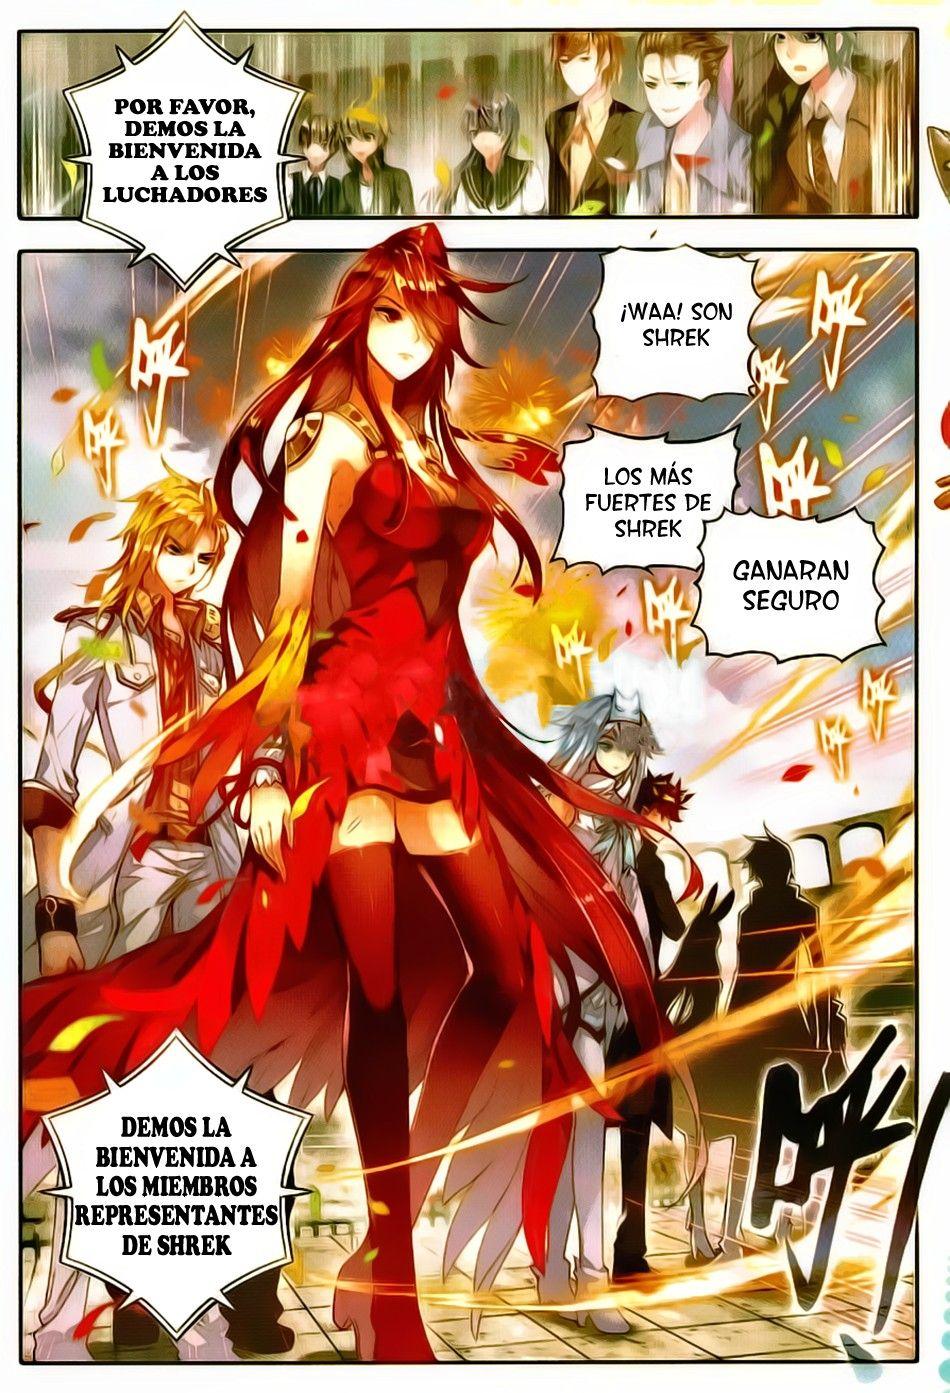 https://c5.ninemanga.com/es_manga/pic2/33/16417/514027/c4a981880e538a69cf3c60d98a6f2a65.jpg Page 3